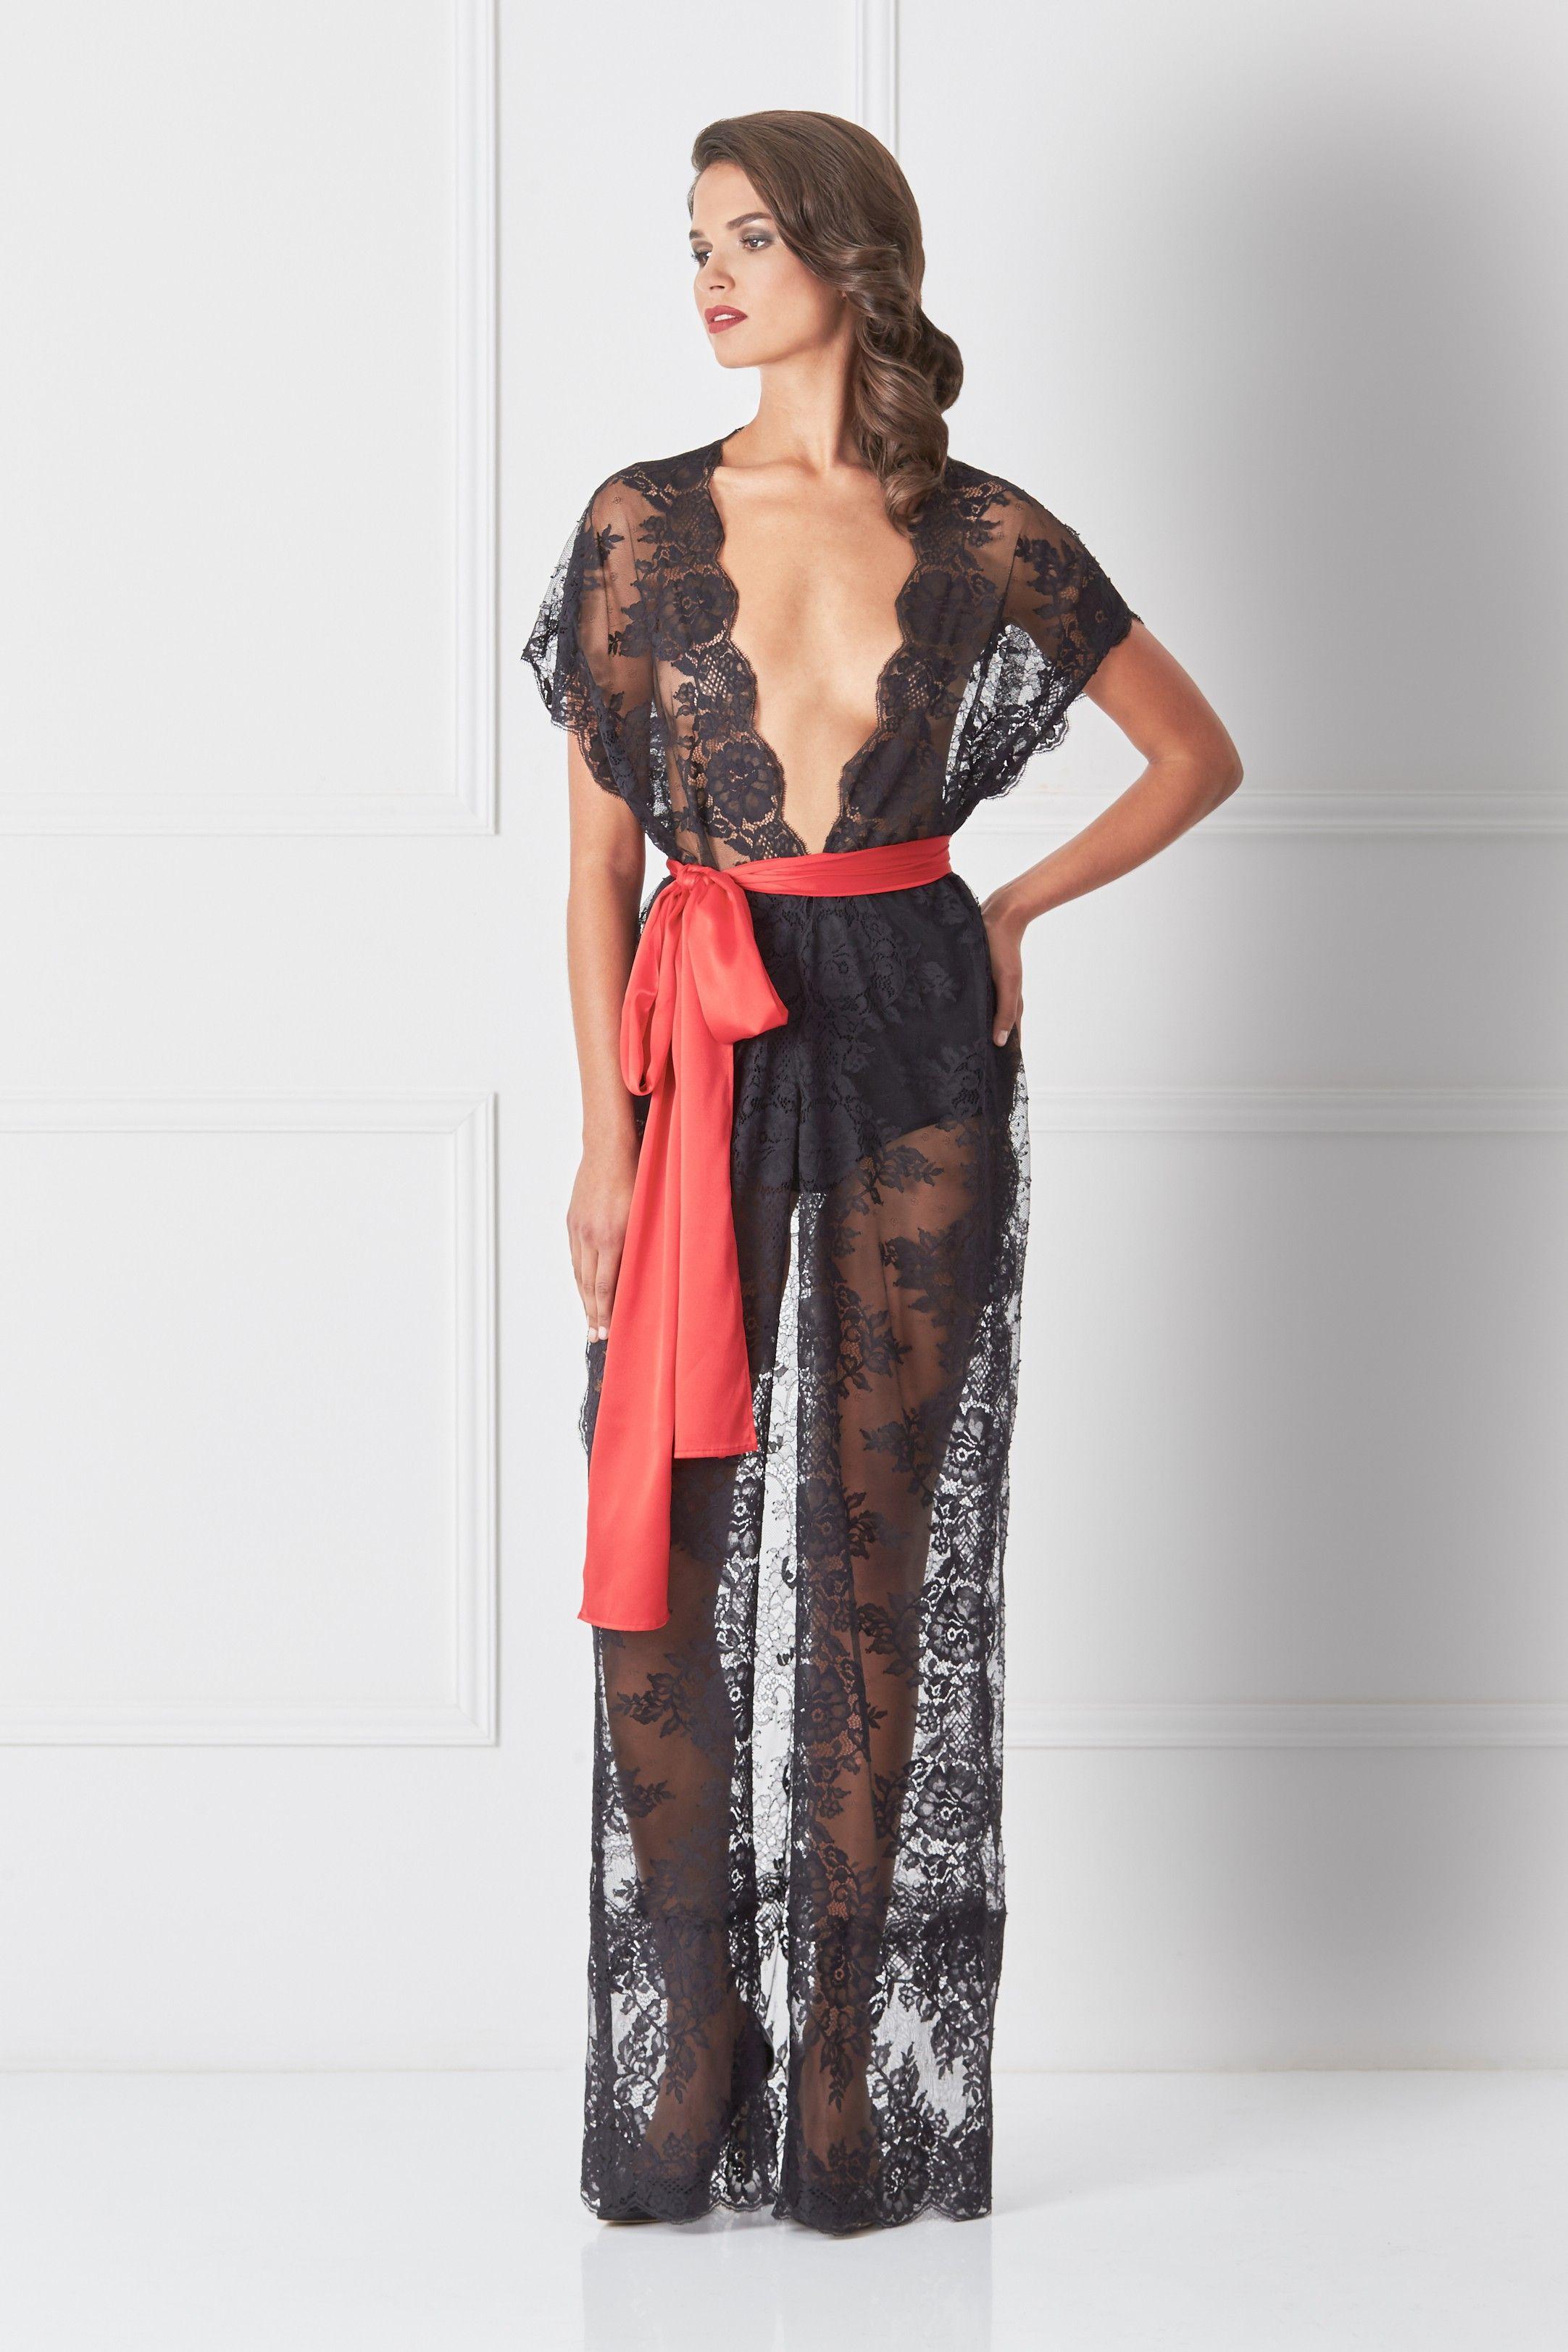 Black Lace MAXI ROBE с поклоном | LONG Nightgown | Pinterest ...